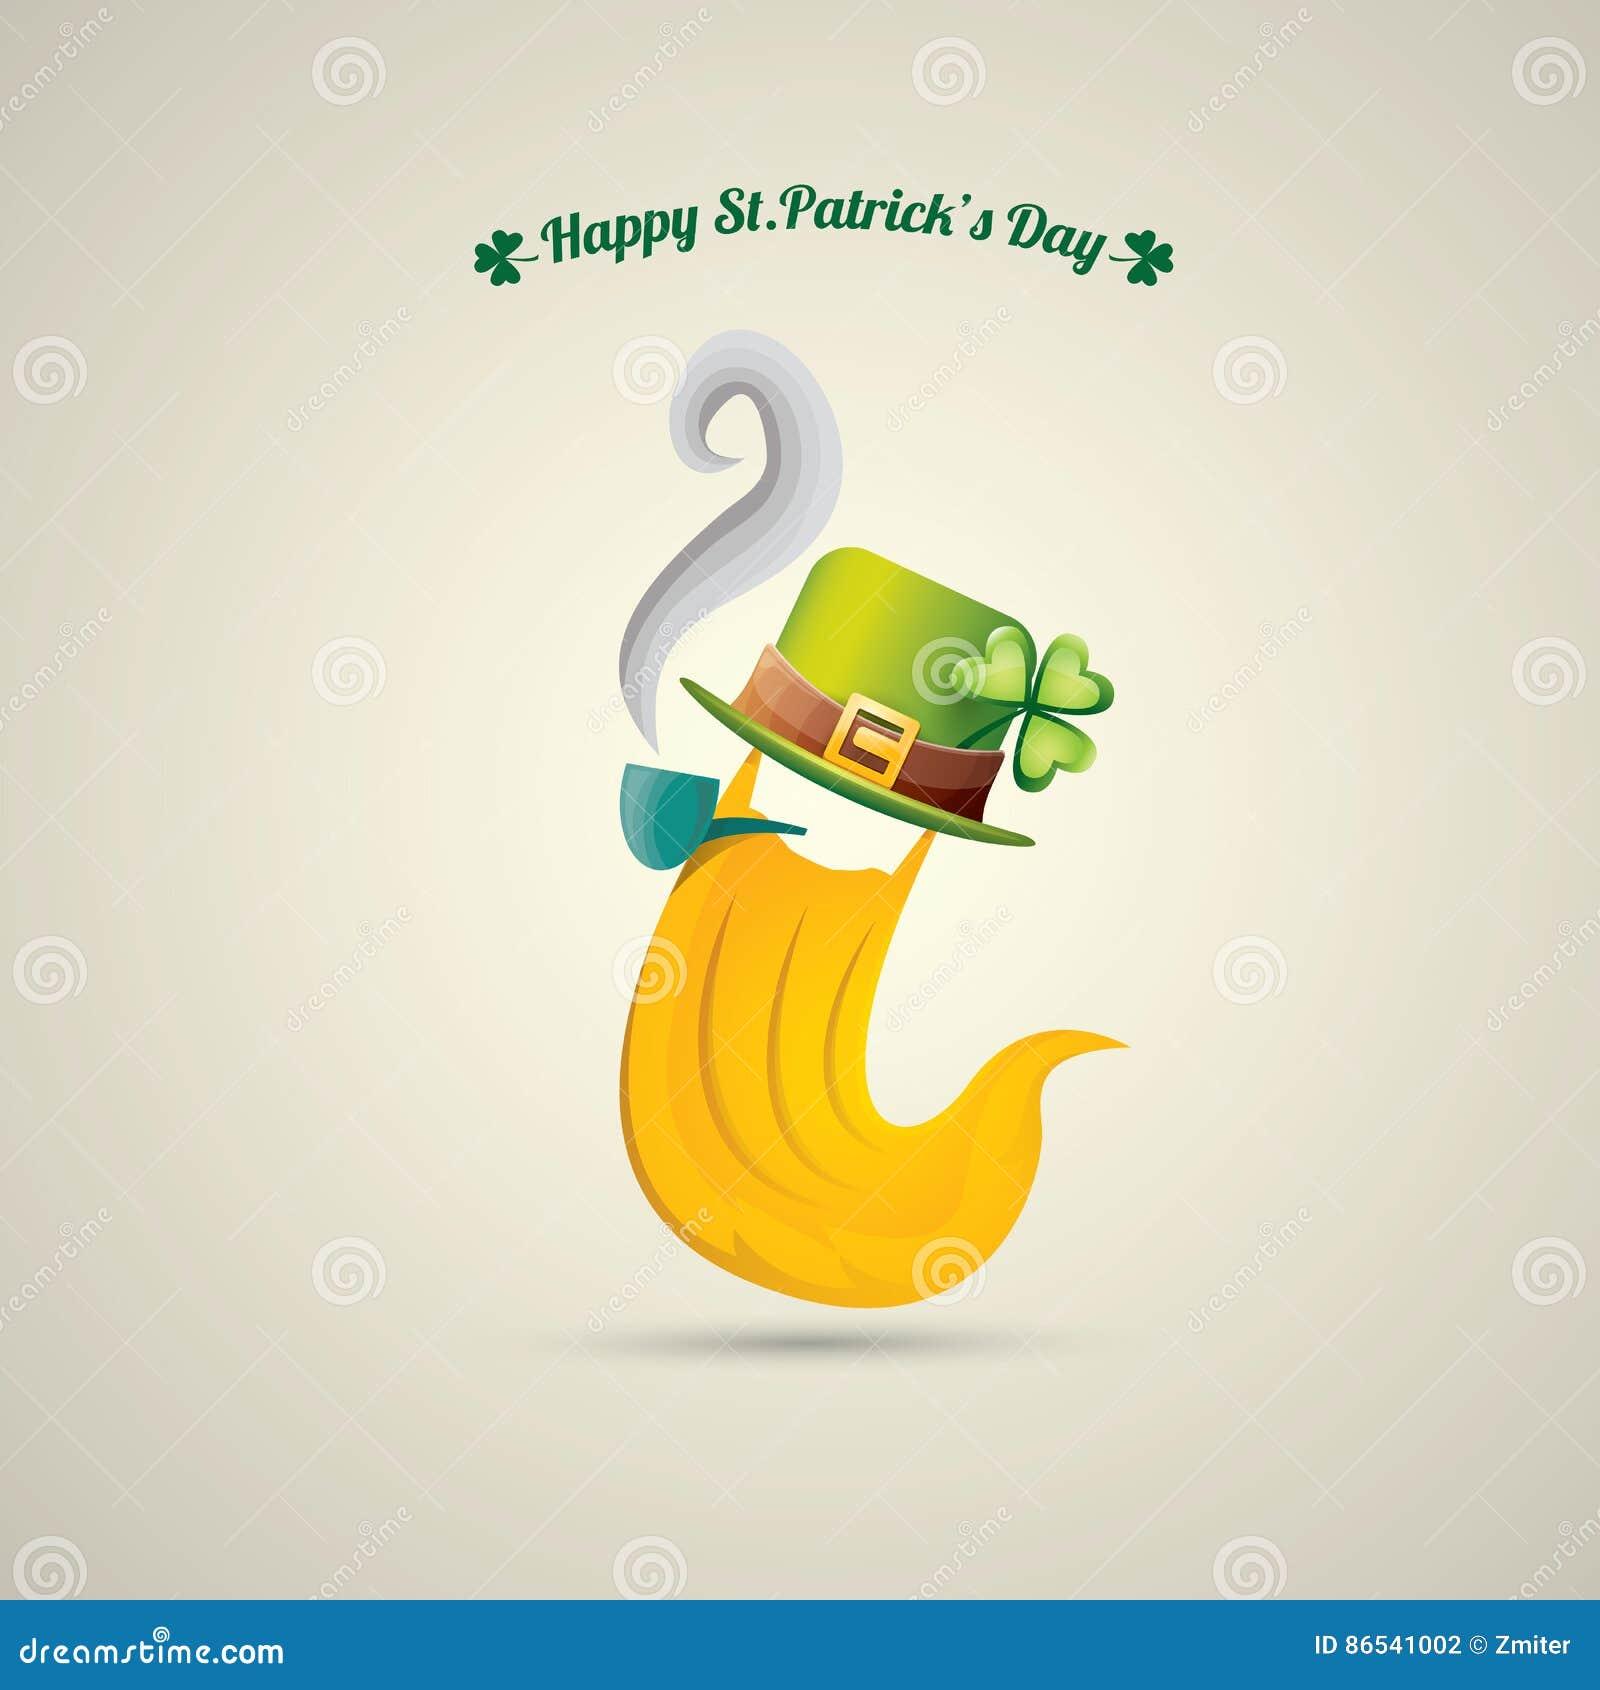 Vector Happy Saint Patricks Day Label Stock Vector Illustration Of